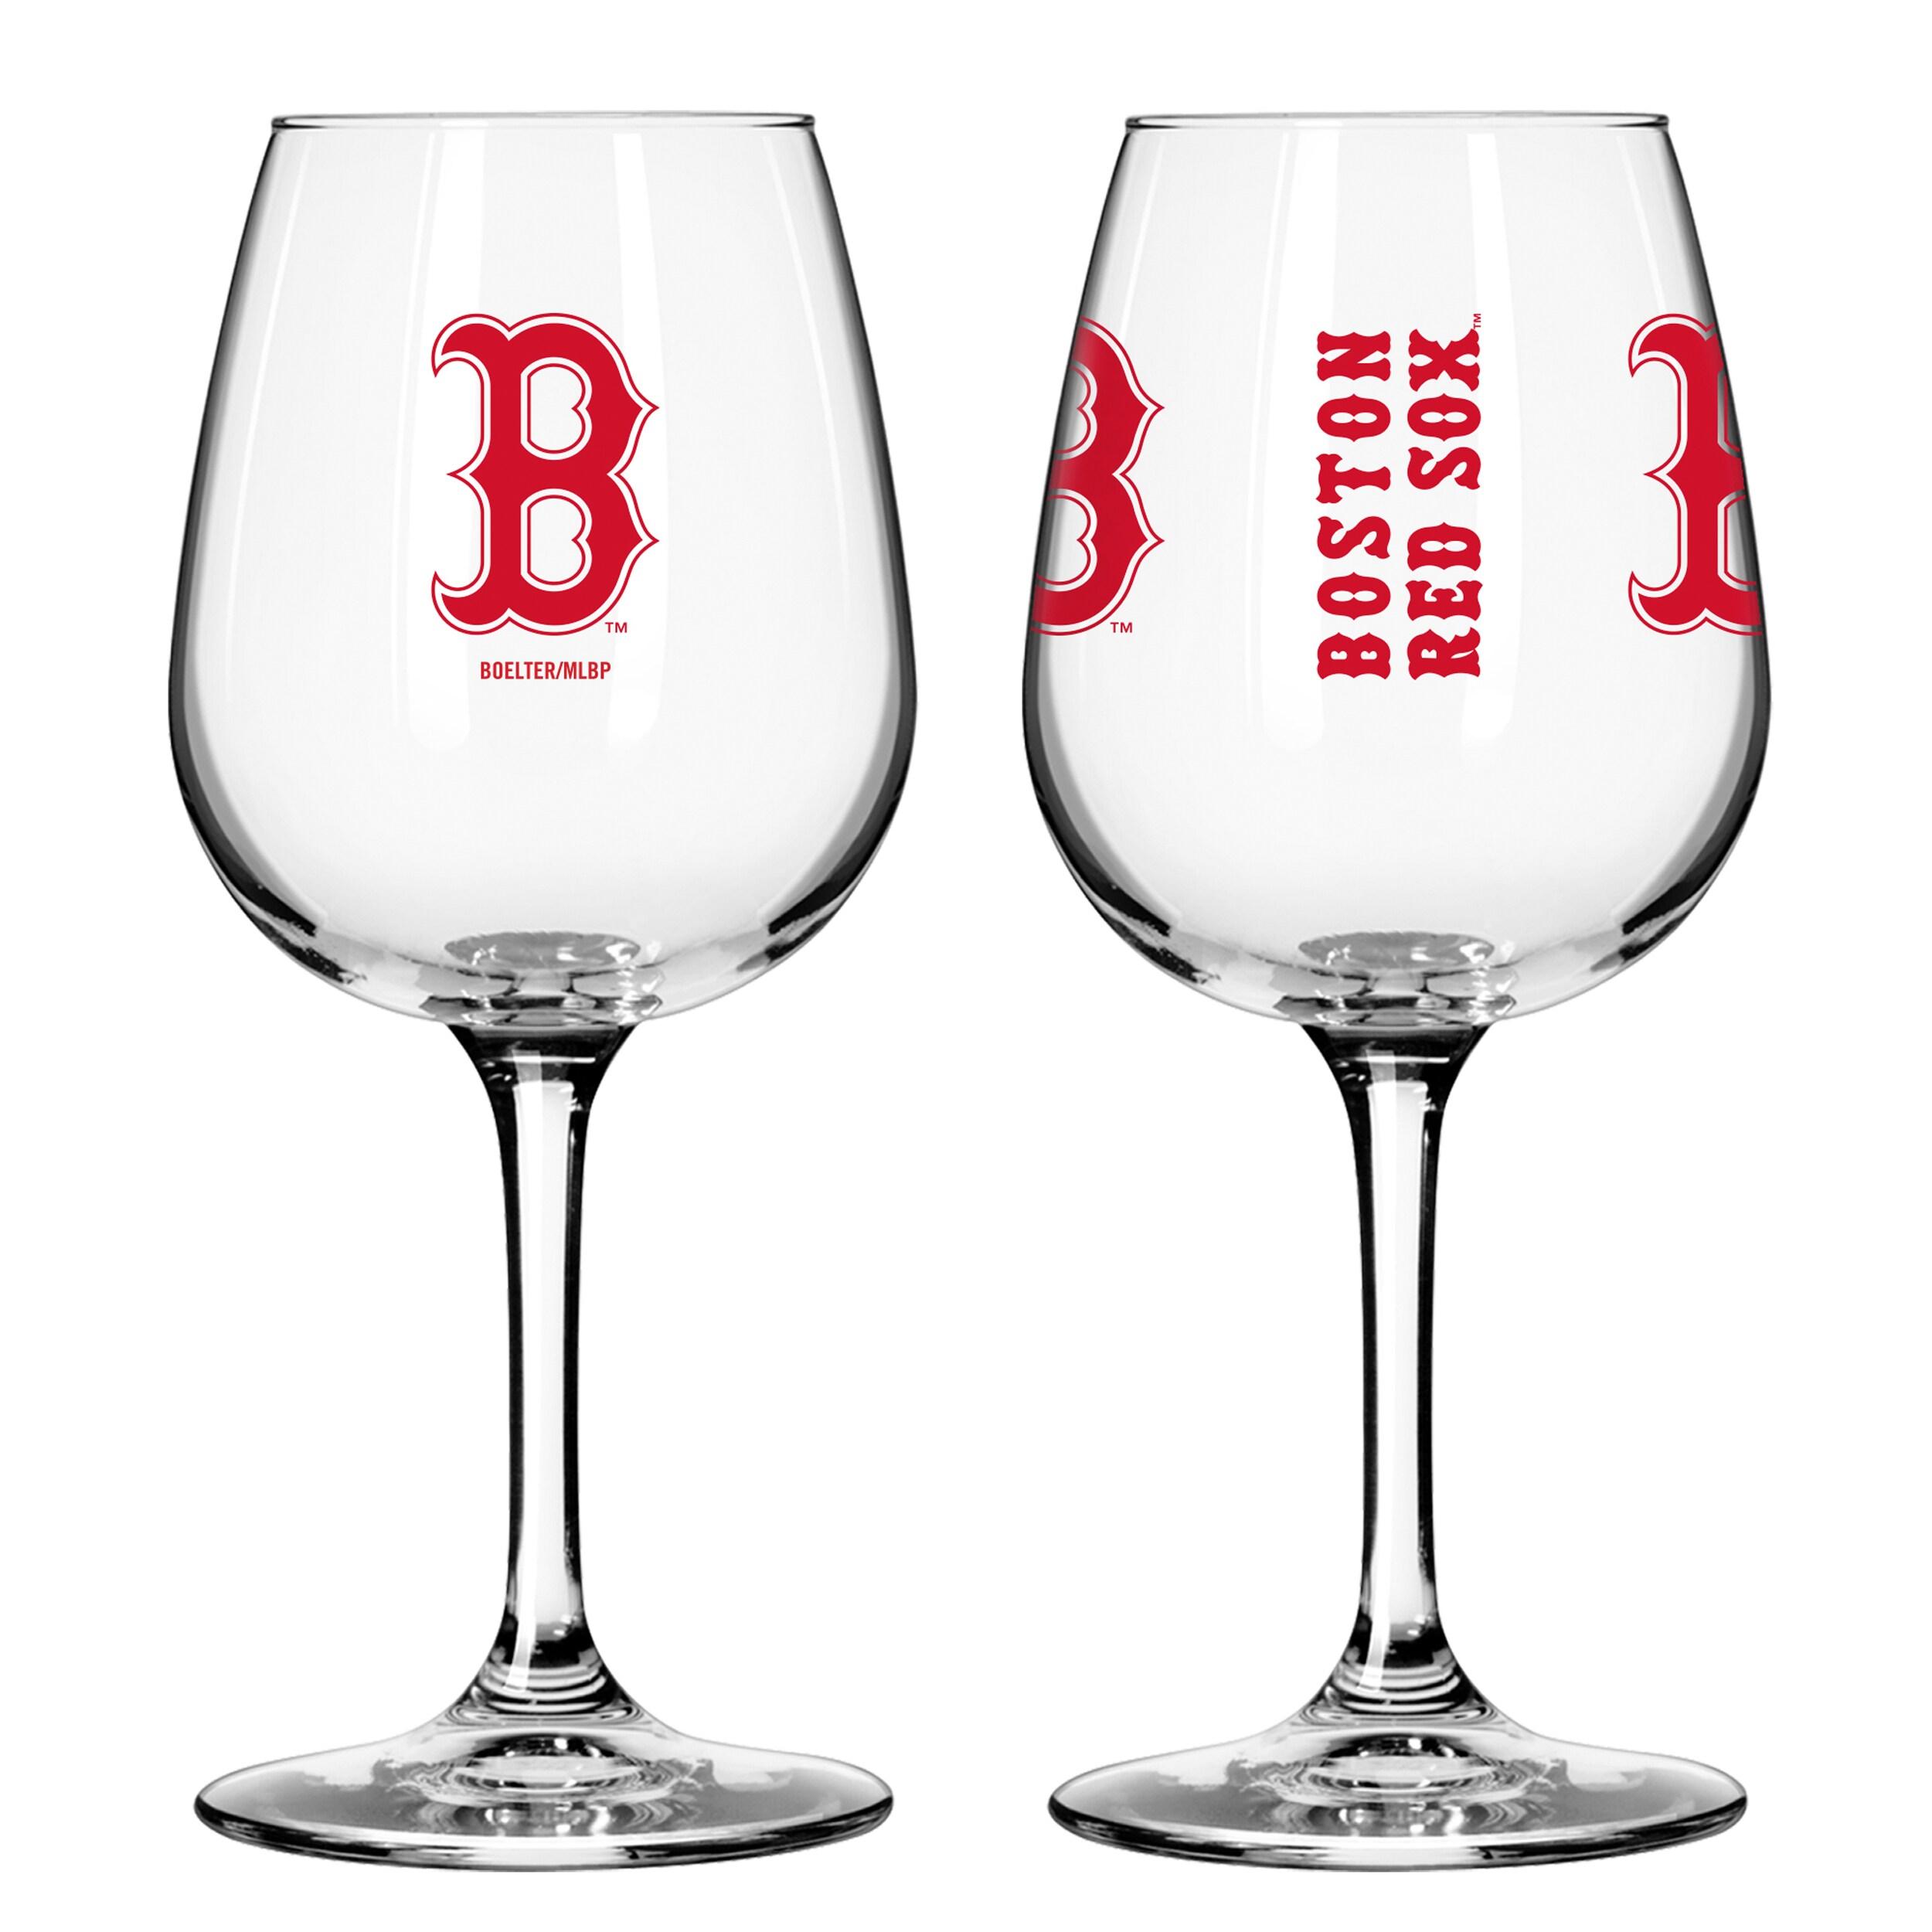 0c038cd42f46 Boelter Brands MLB Set of Two 12 Ounce Wine Glass Set, Boston Red Sox -  Walmart.com